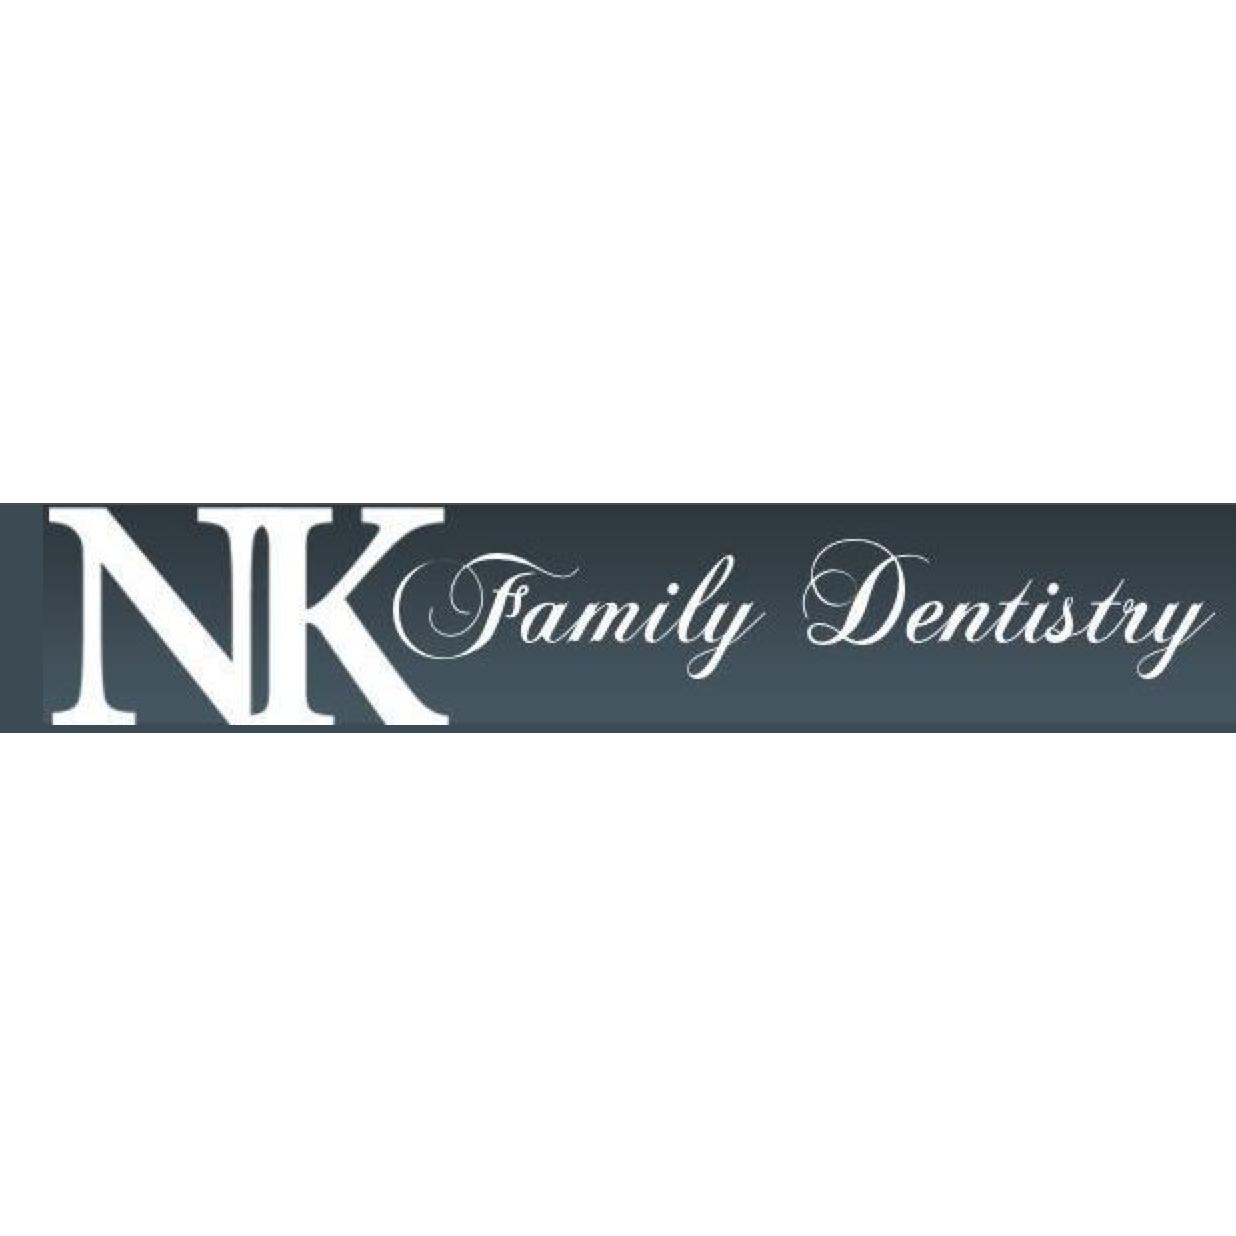 NK Family Dentistry